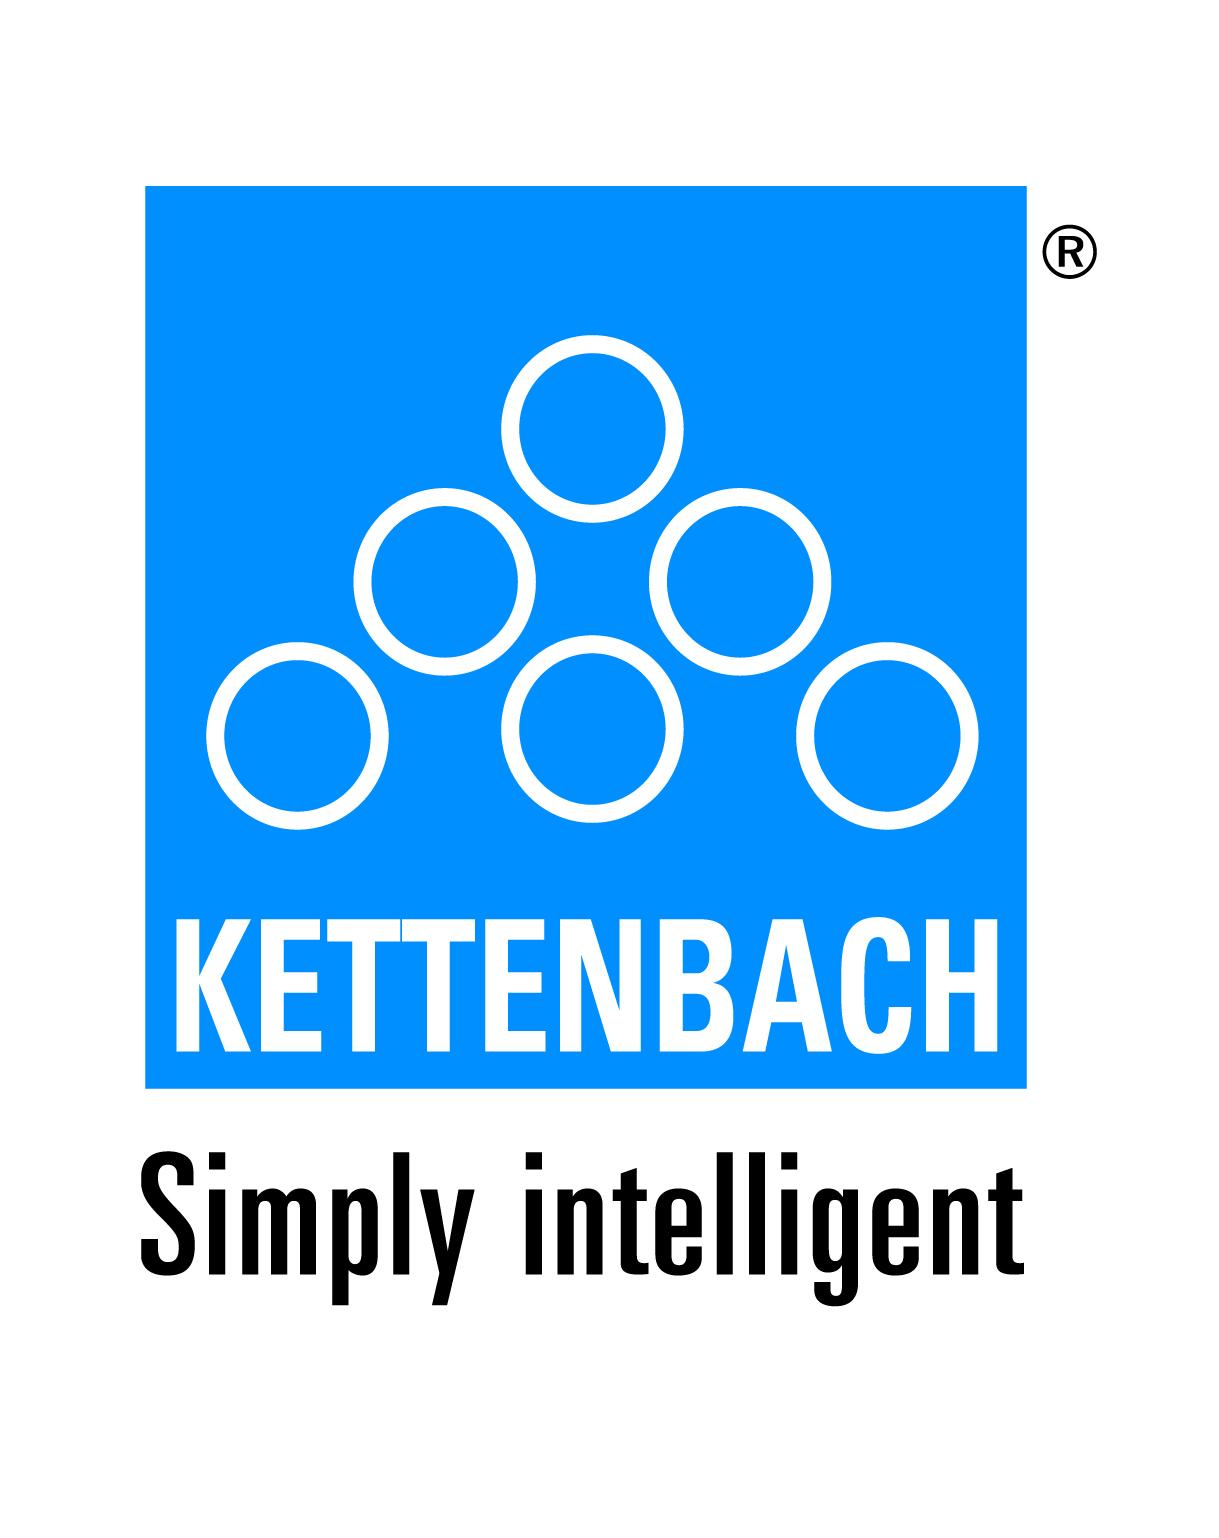 Kettenback Gmbh & Co. Kg.